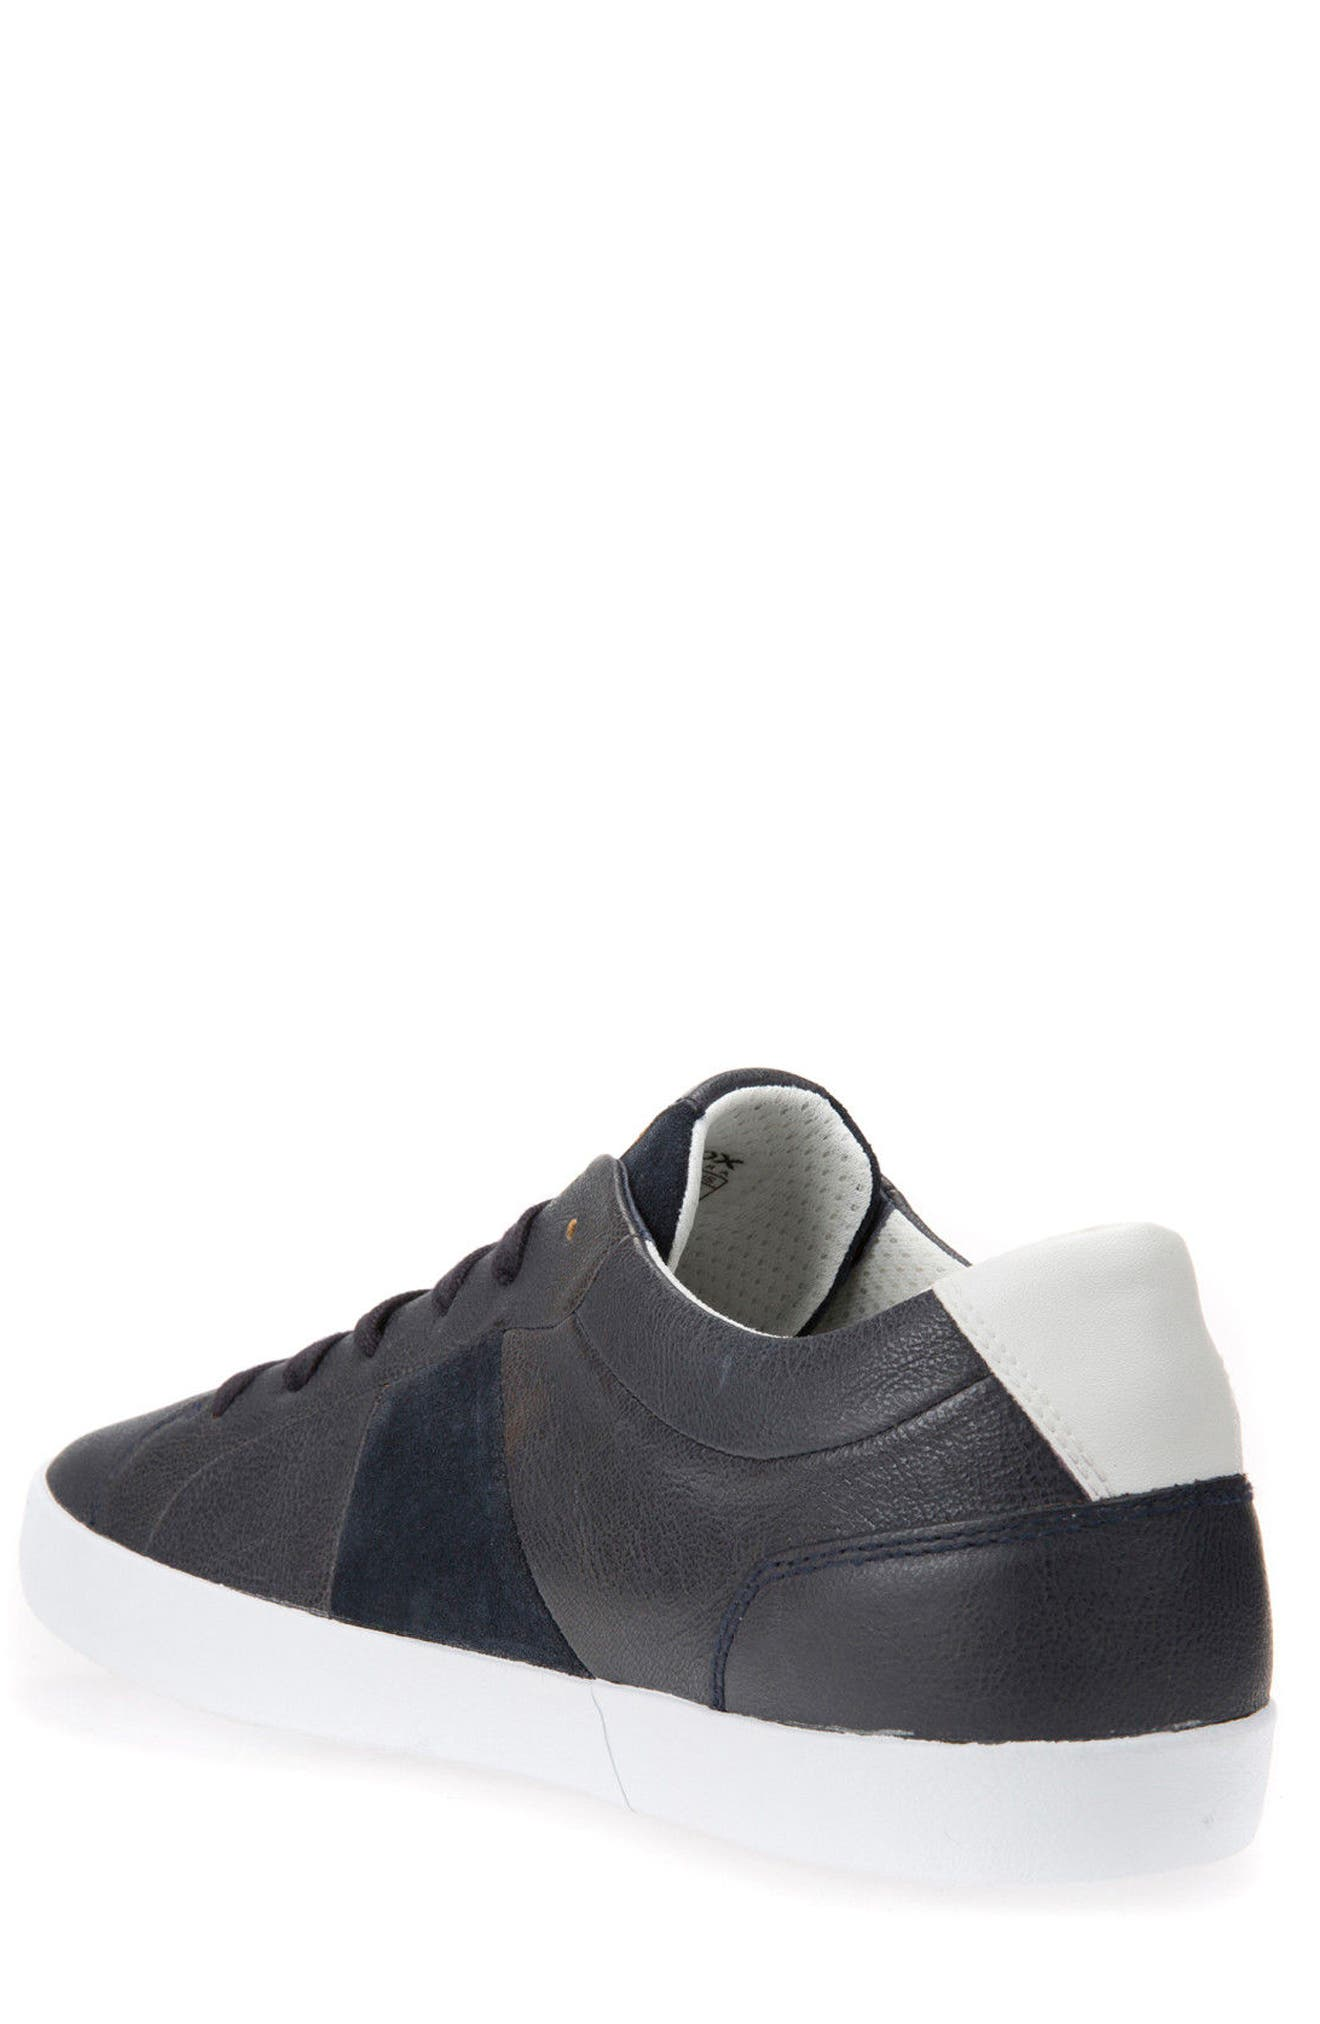 Smart 77 Sneaker,                             Alternate thumbnail 2, color,                             Navy Leather